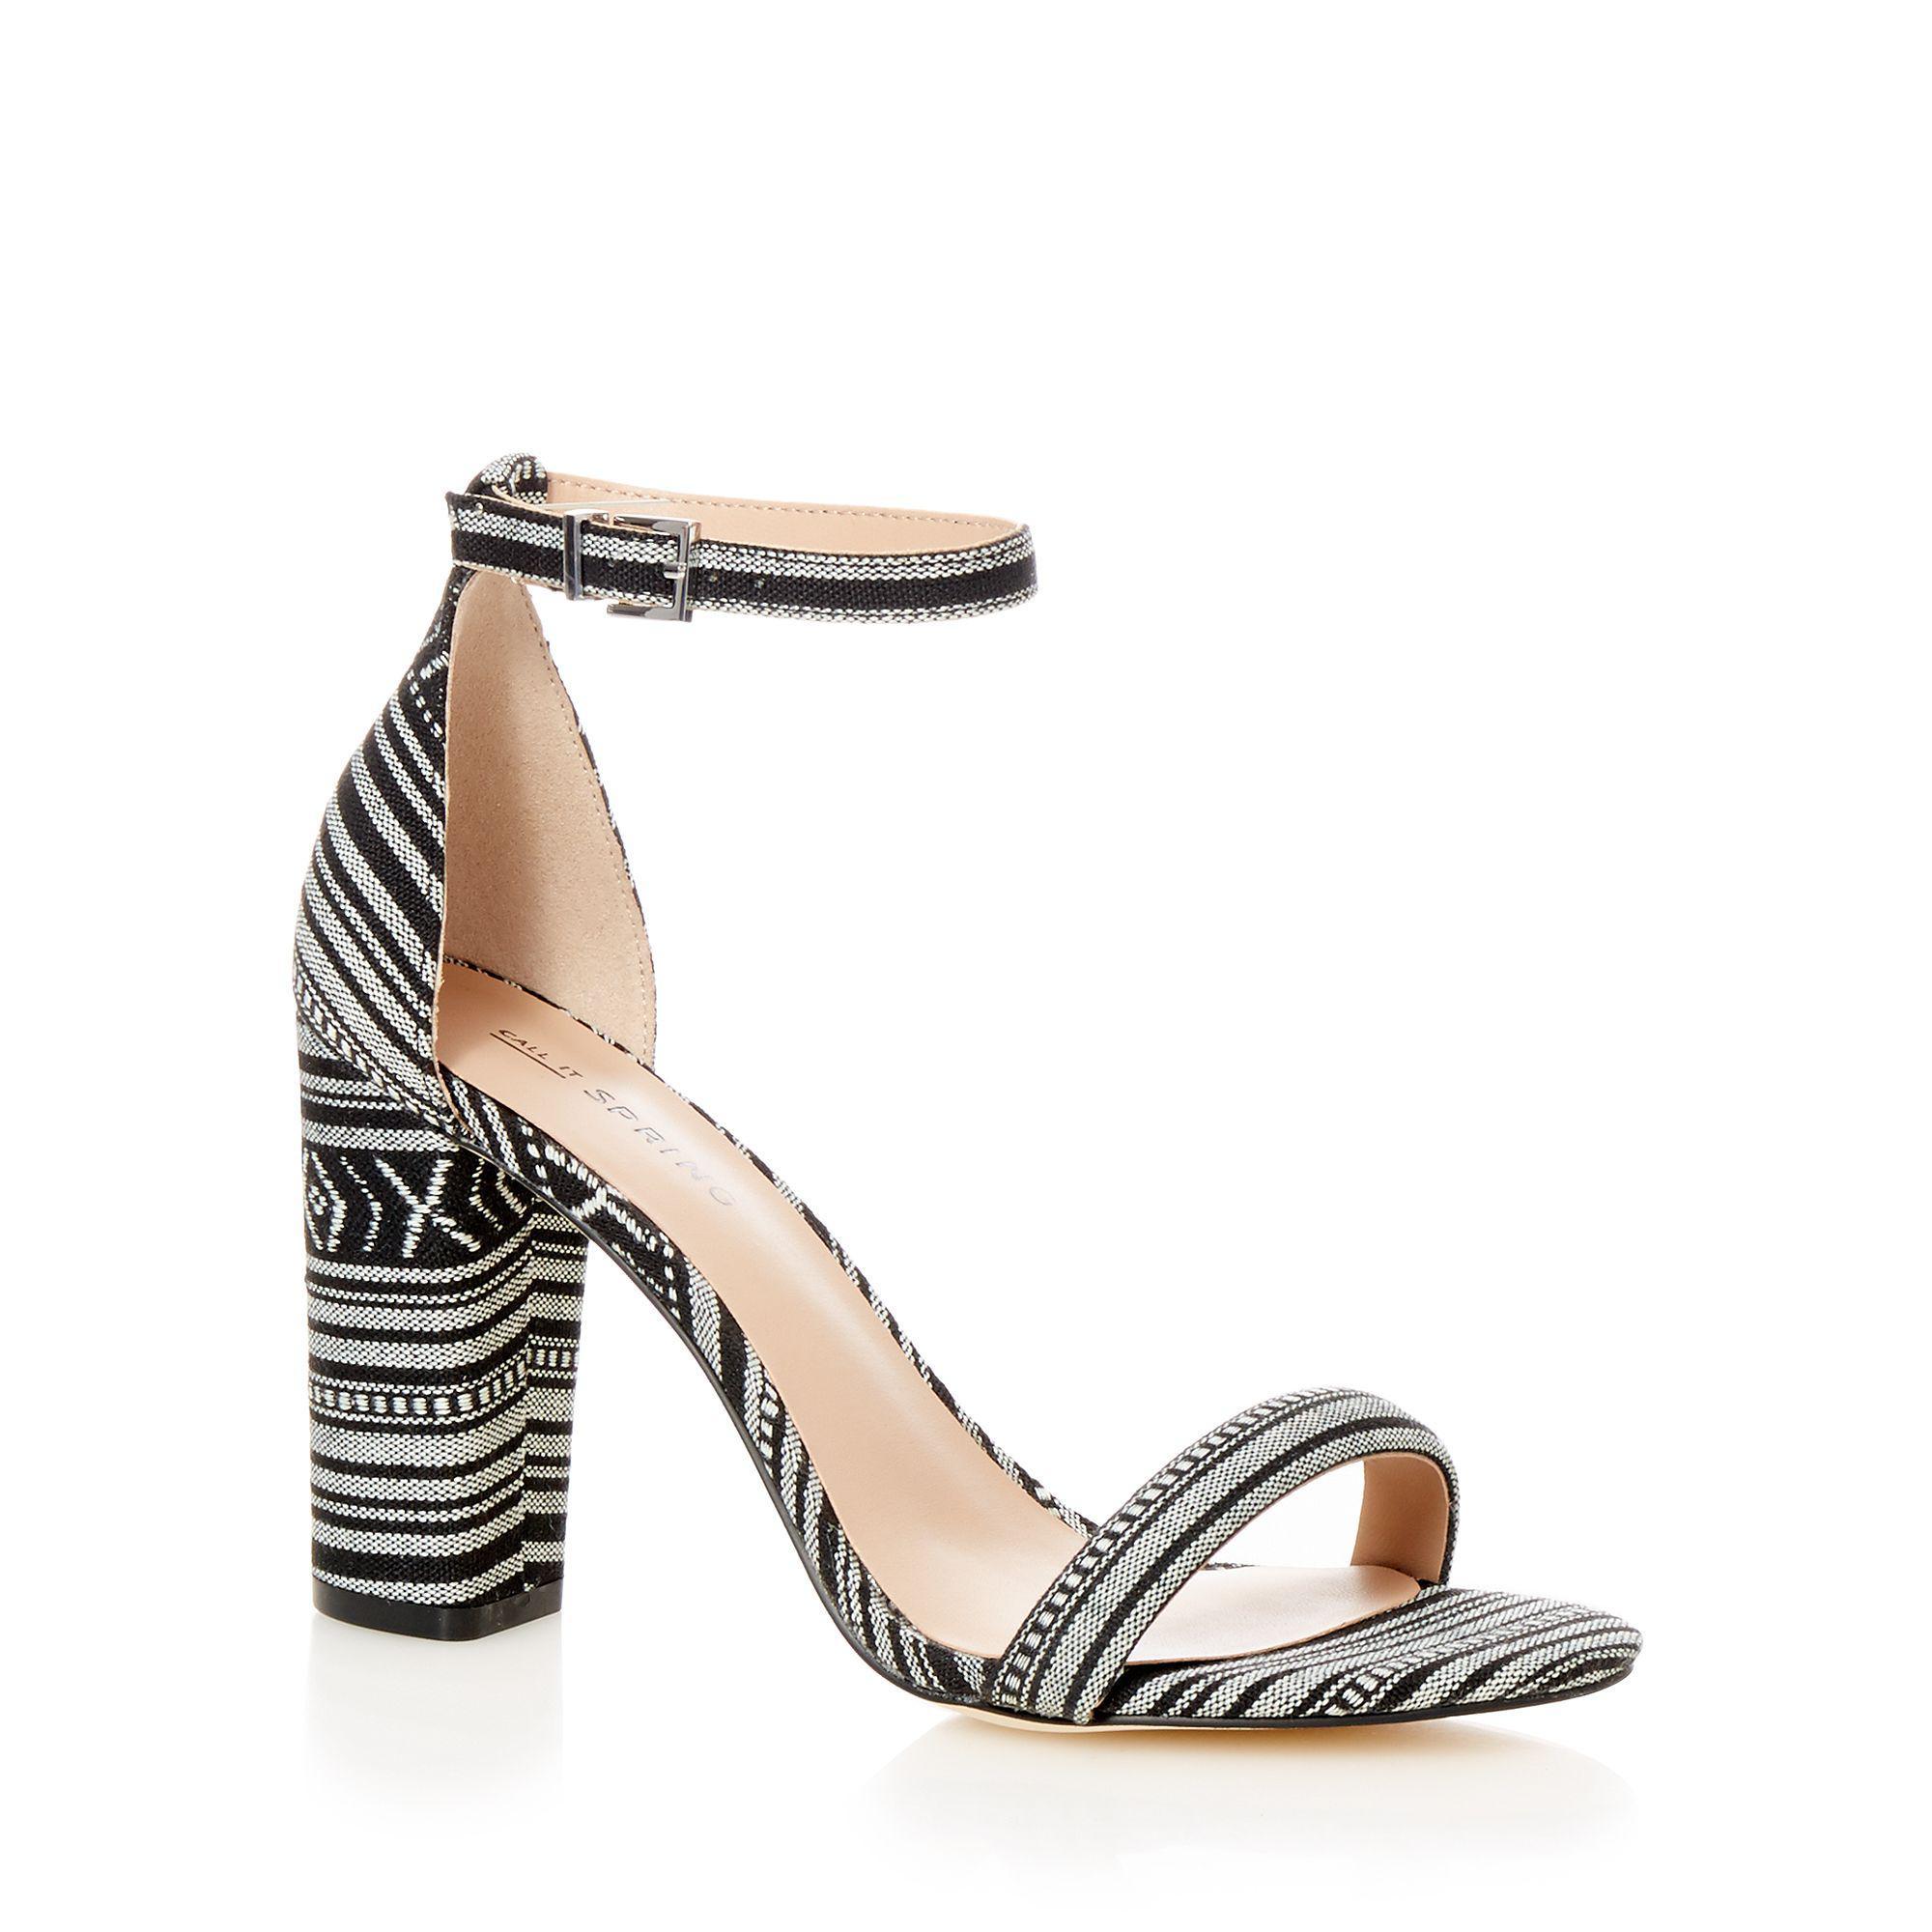 d17c7ed8200b Call It Spring Black  brelawien  High Block Heel Ankle Strap Sandals ...